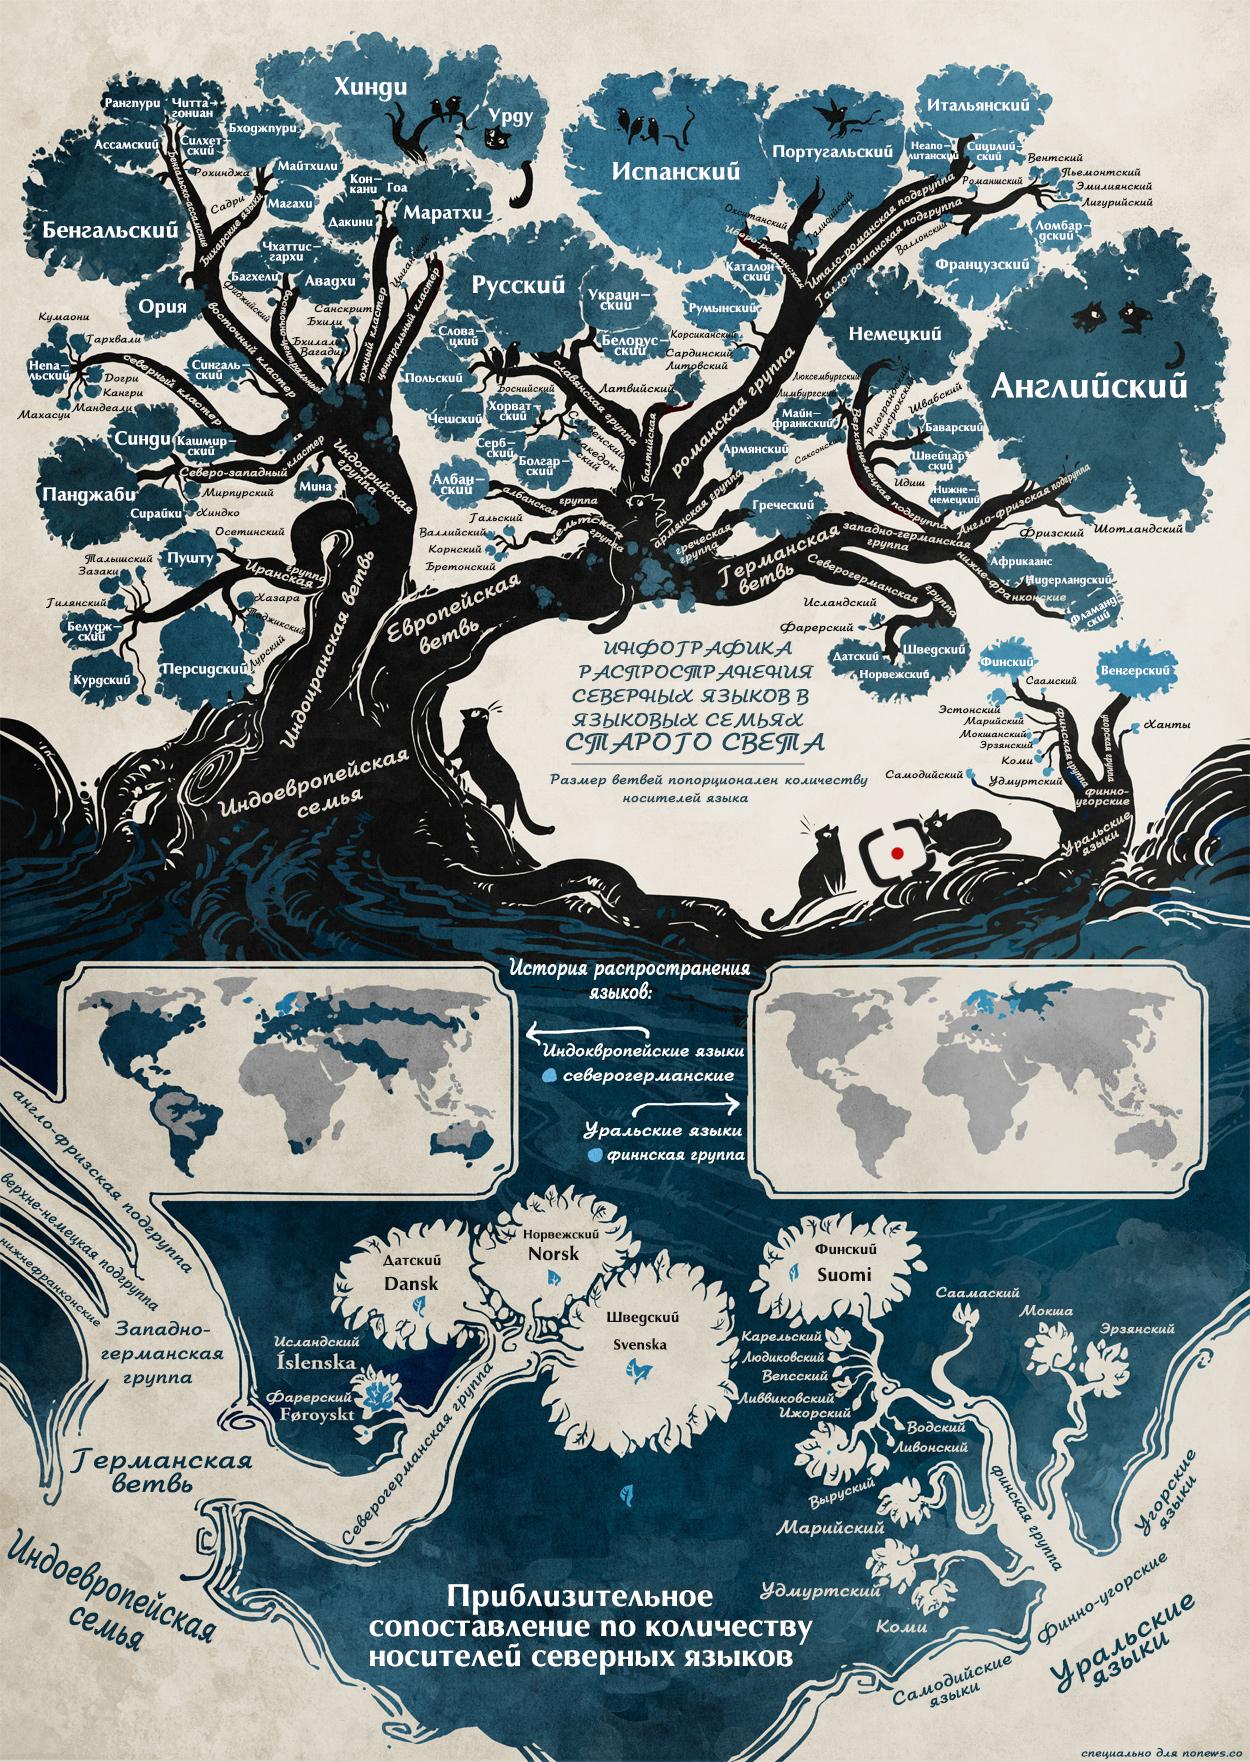 Инфографика: языки Старого Света